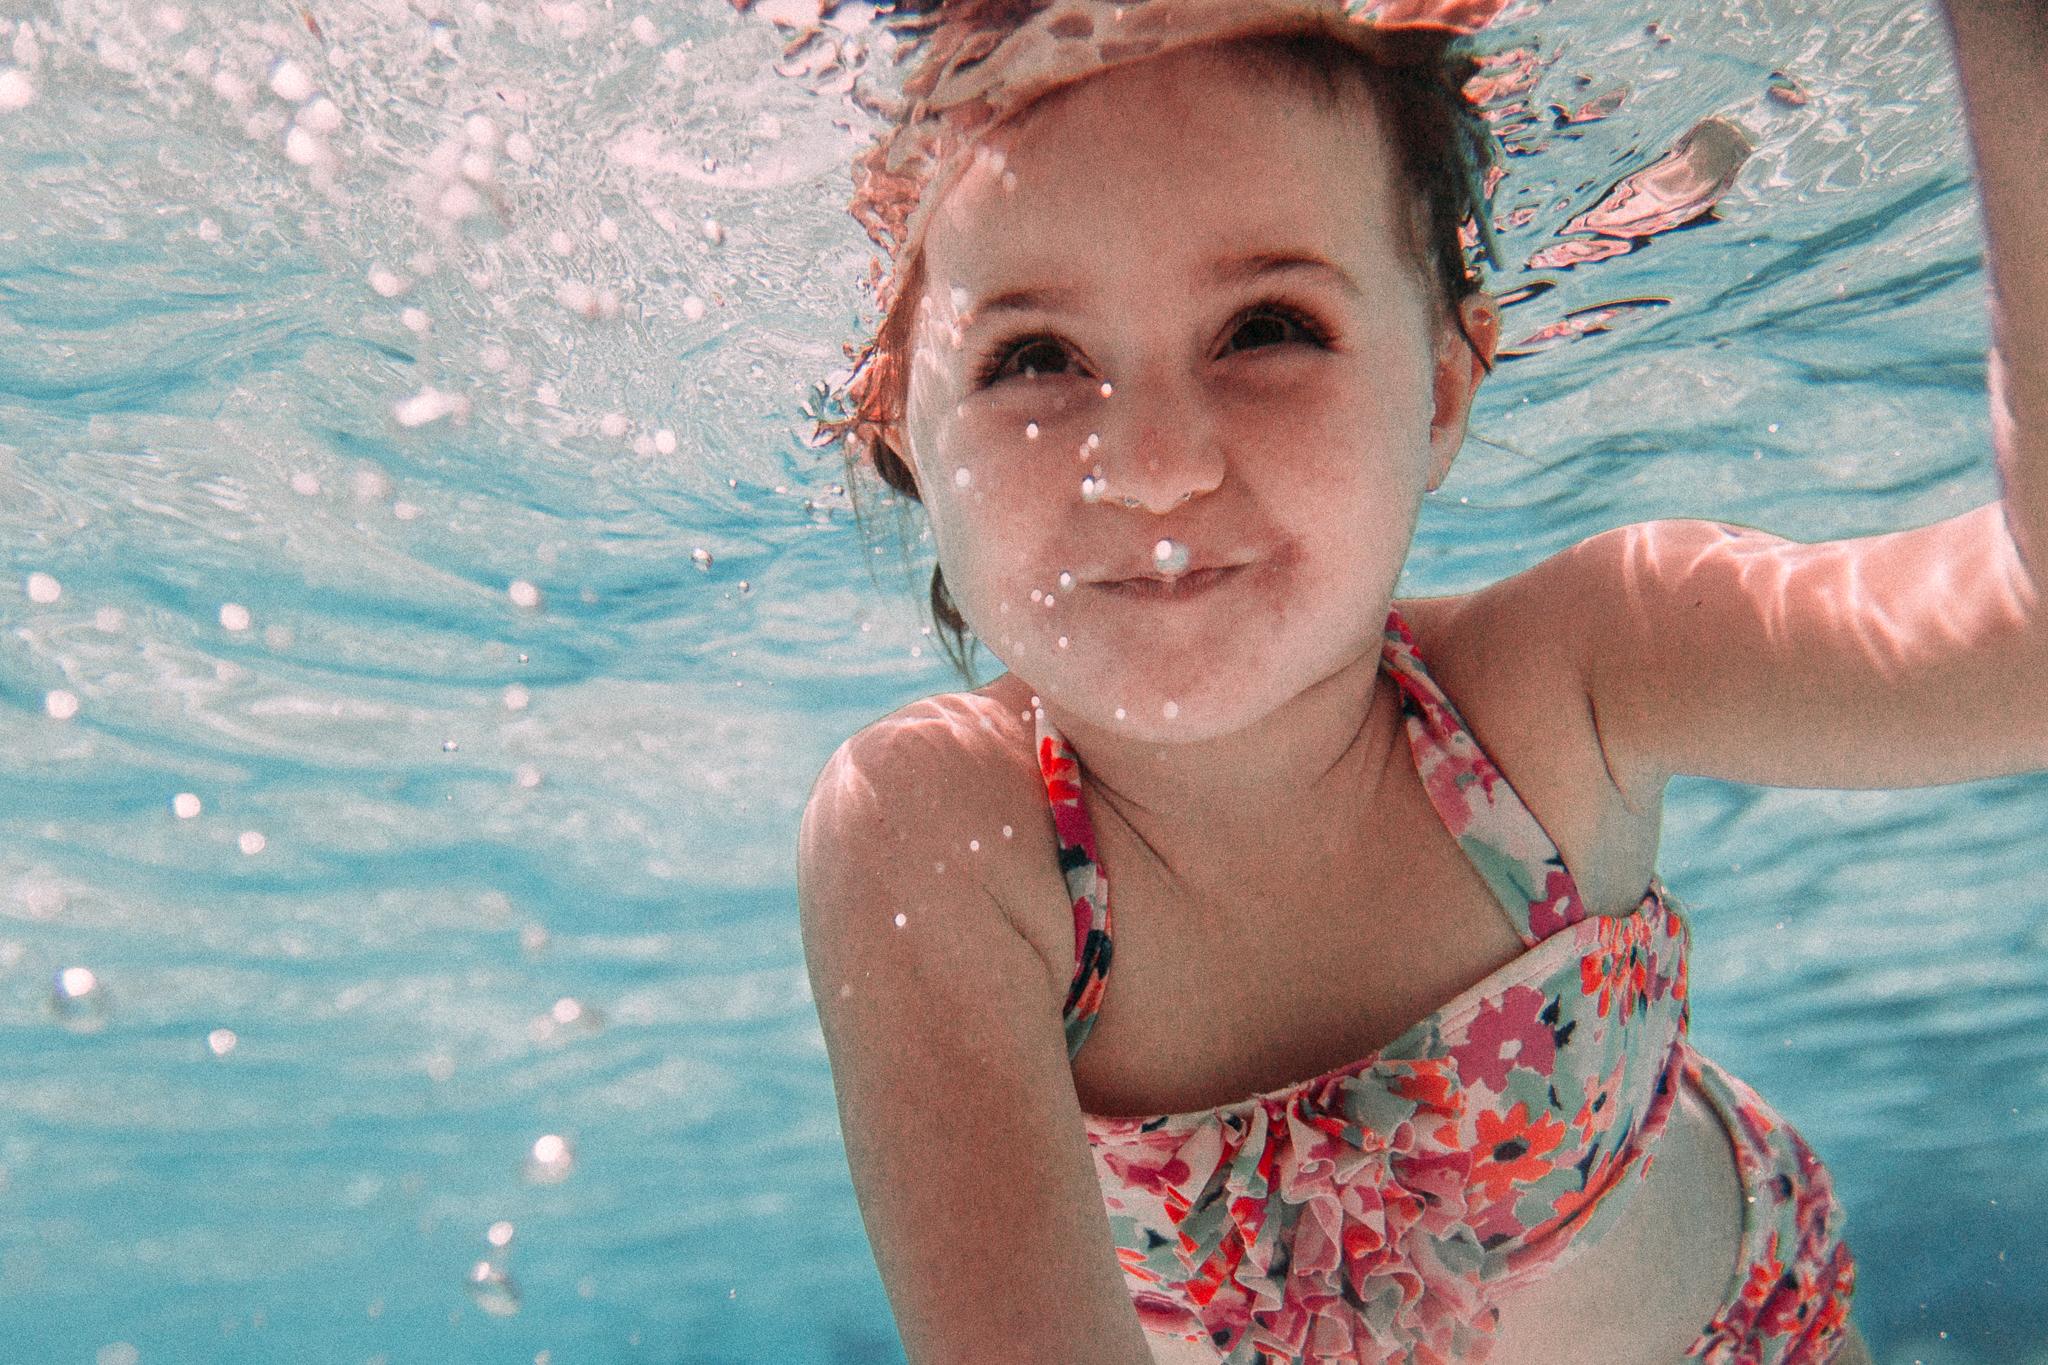 underwater portrait girl swimming pool summer Ashburn Loudoun Northern Virginia family lifestyle documentary childhood Marti Austin Photography